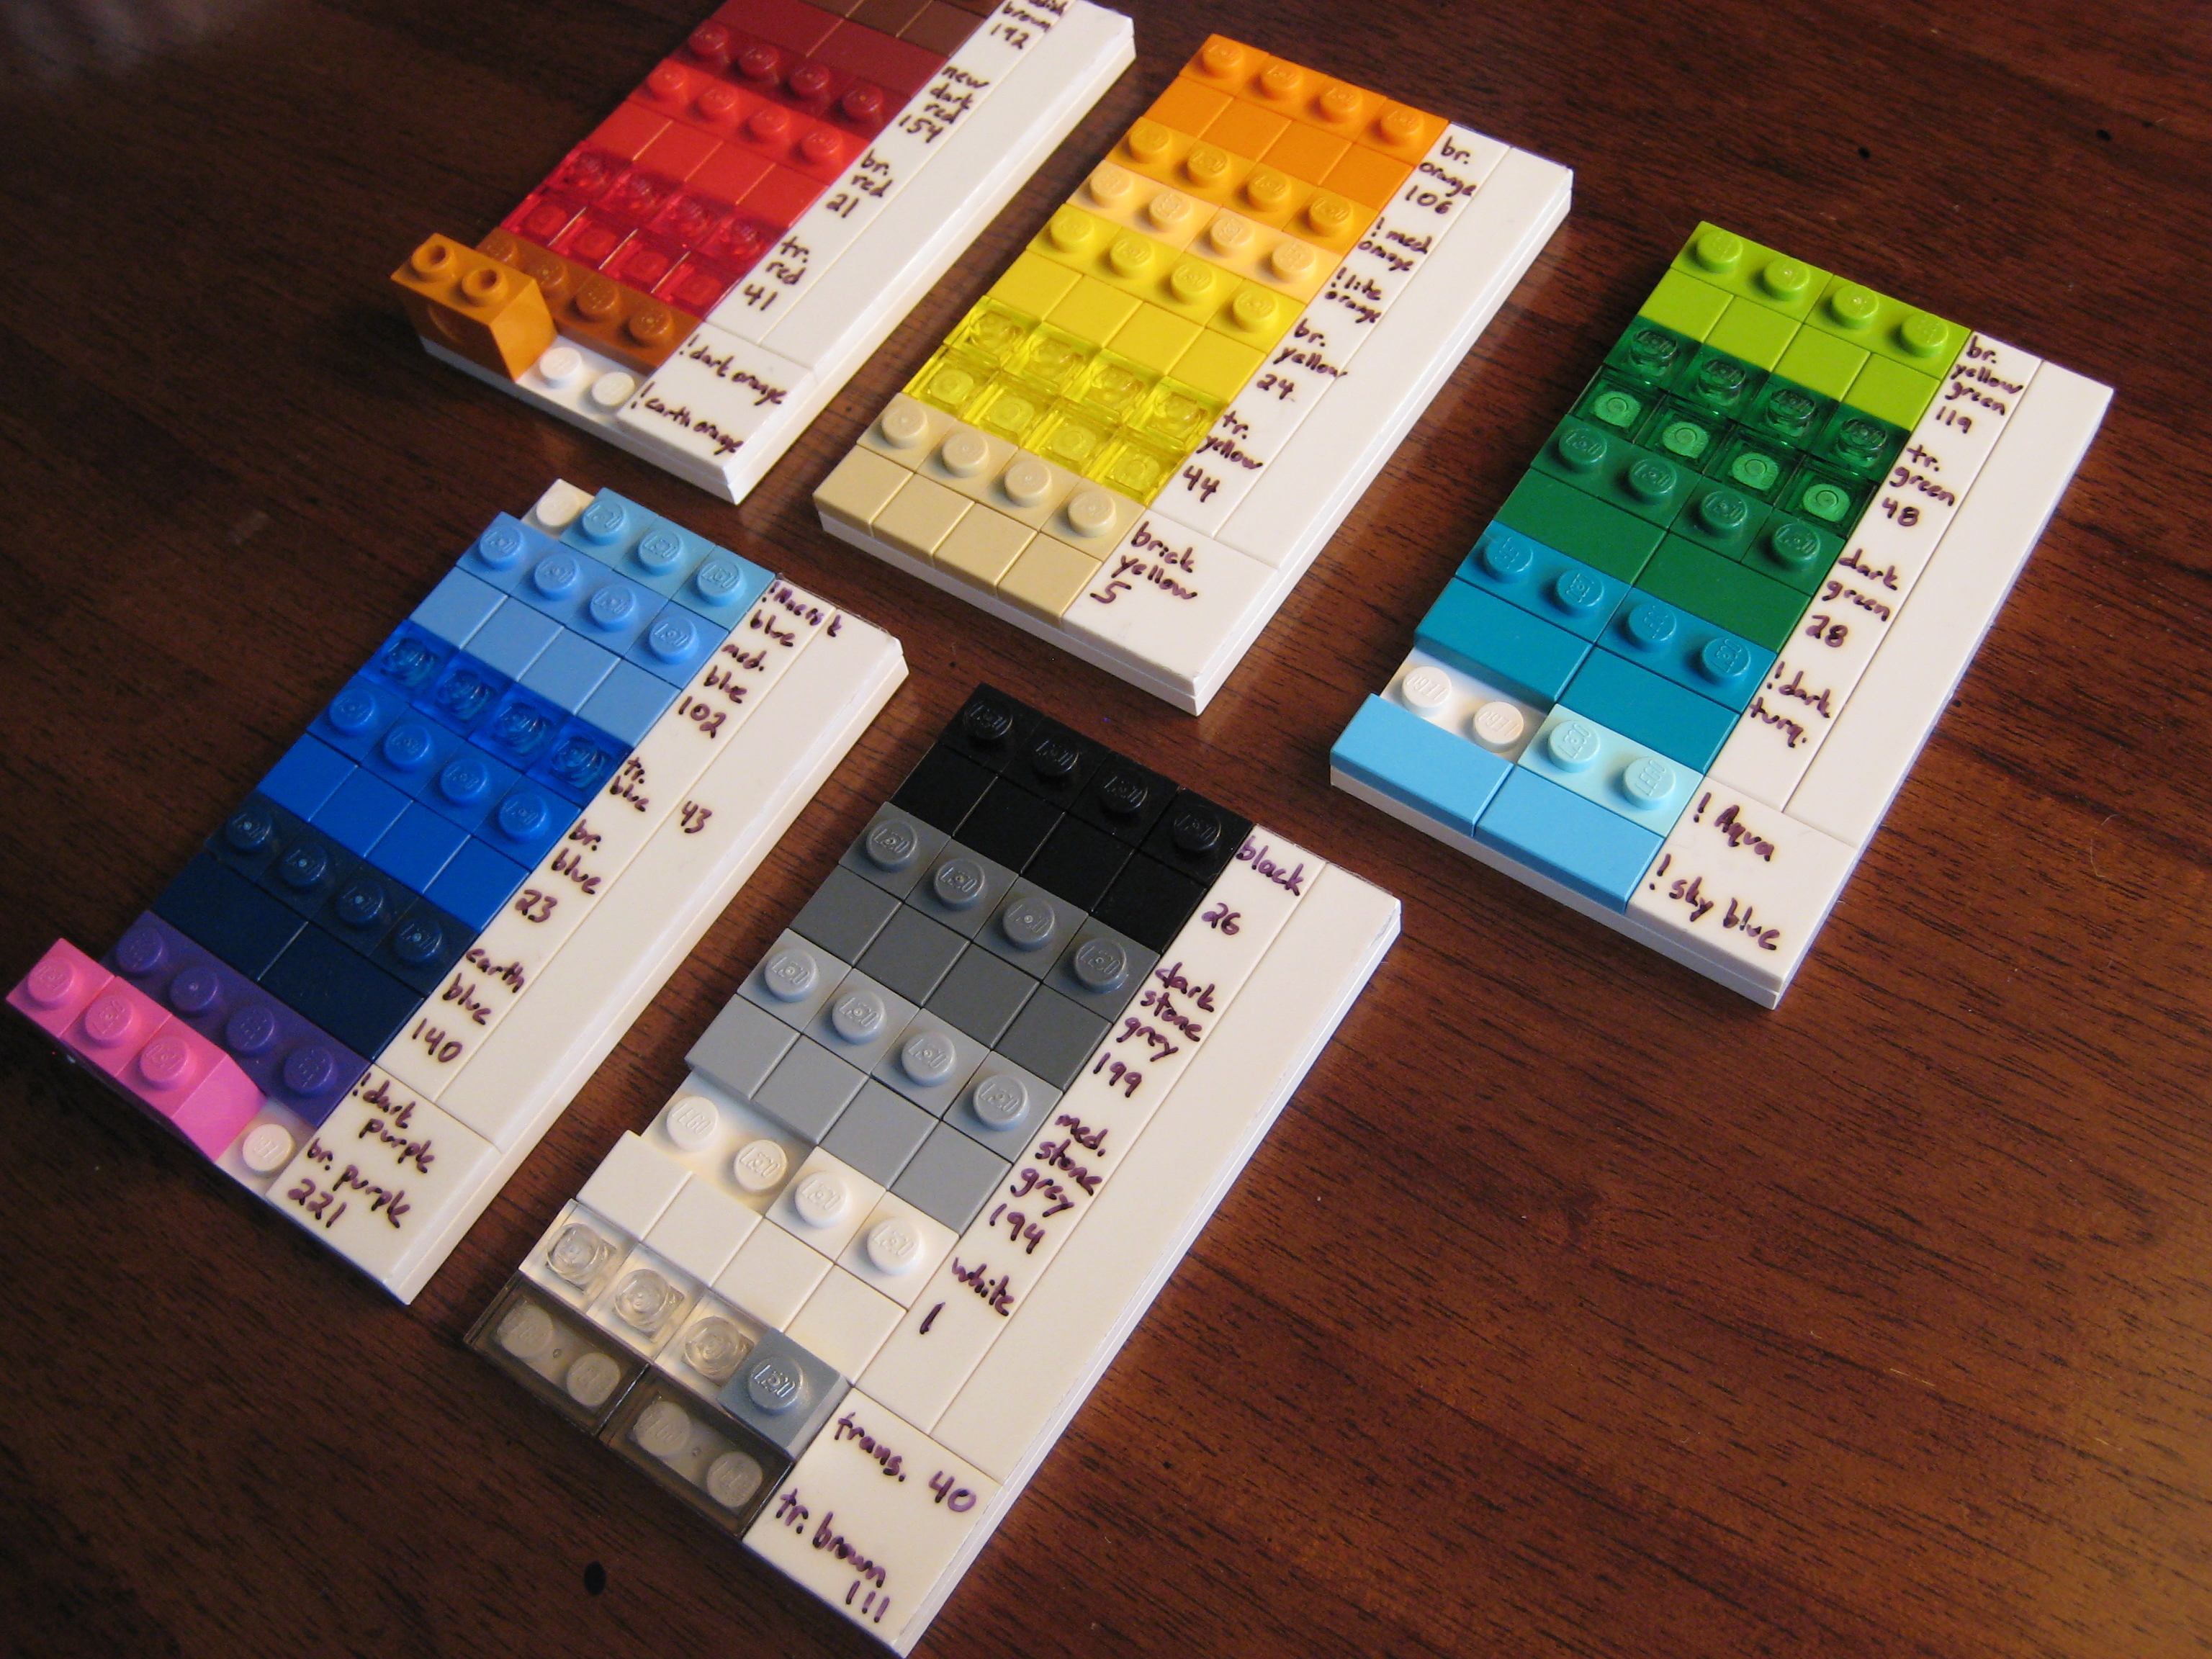 Lego Stock Chart: LEGO Color Palette.jpg - Wikimedia Commons,Chart